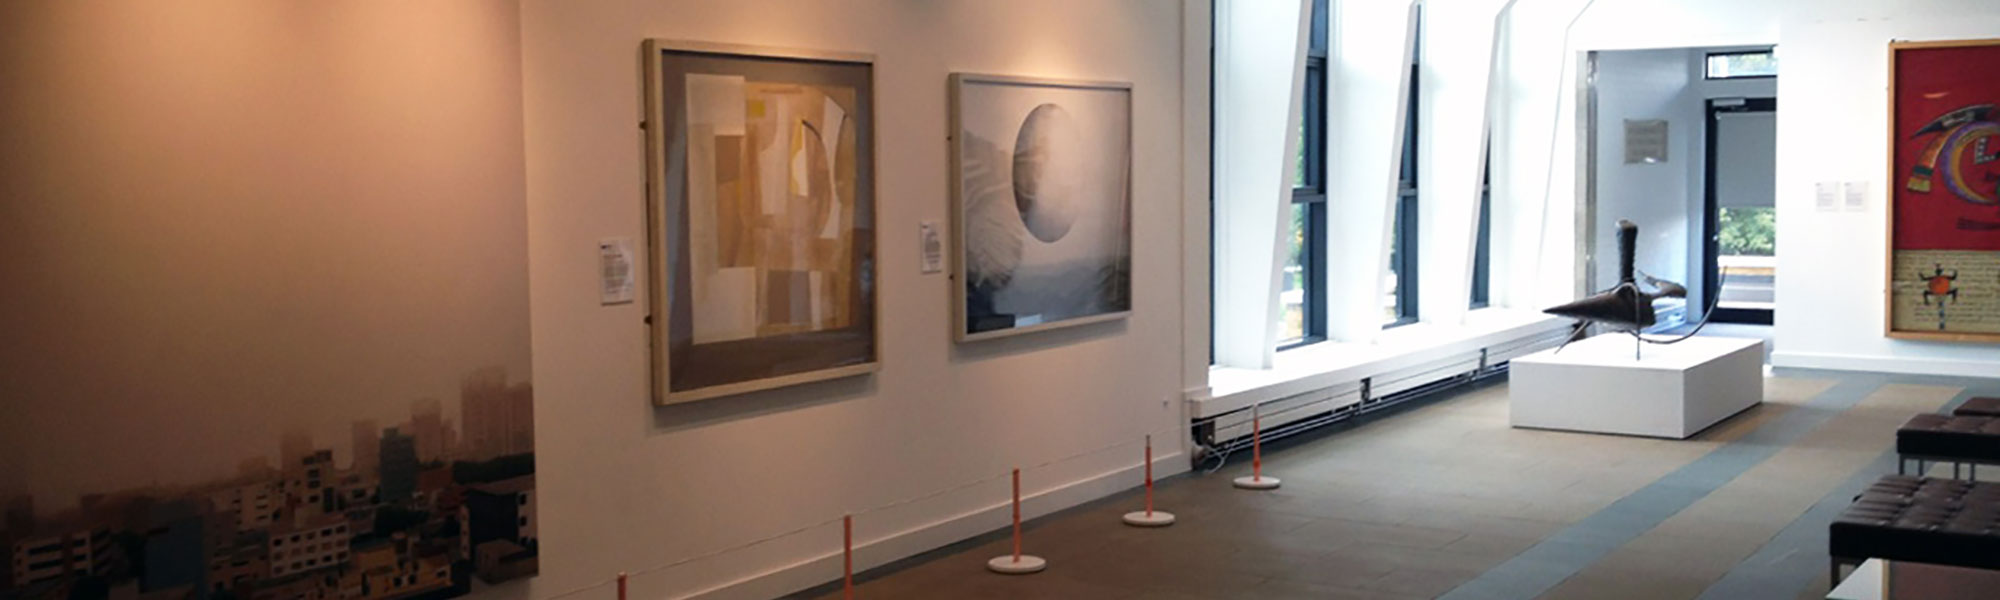 Chapman Gallery Empty